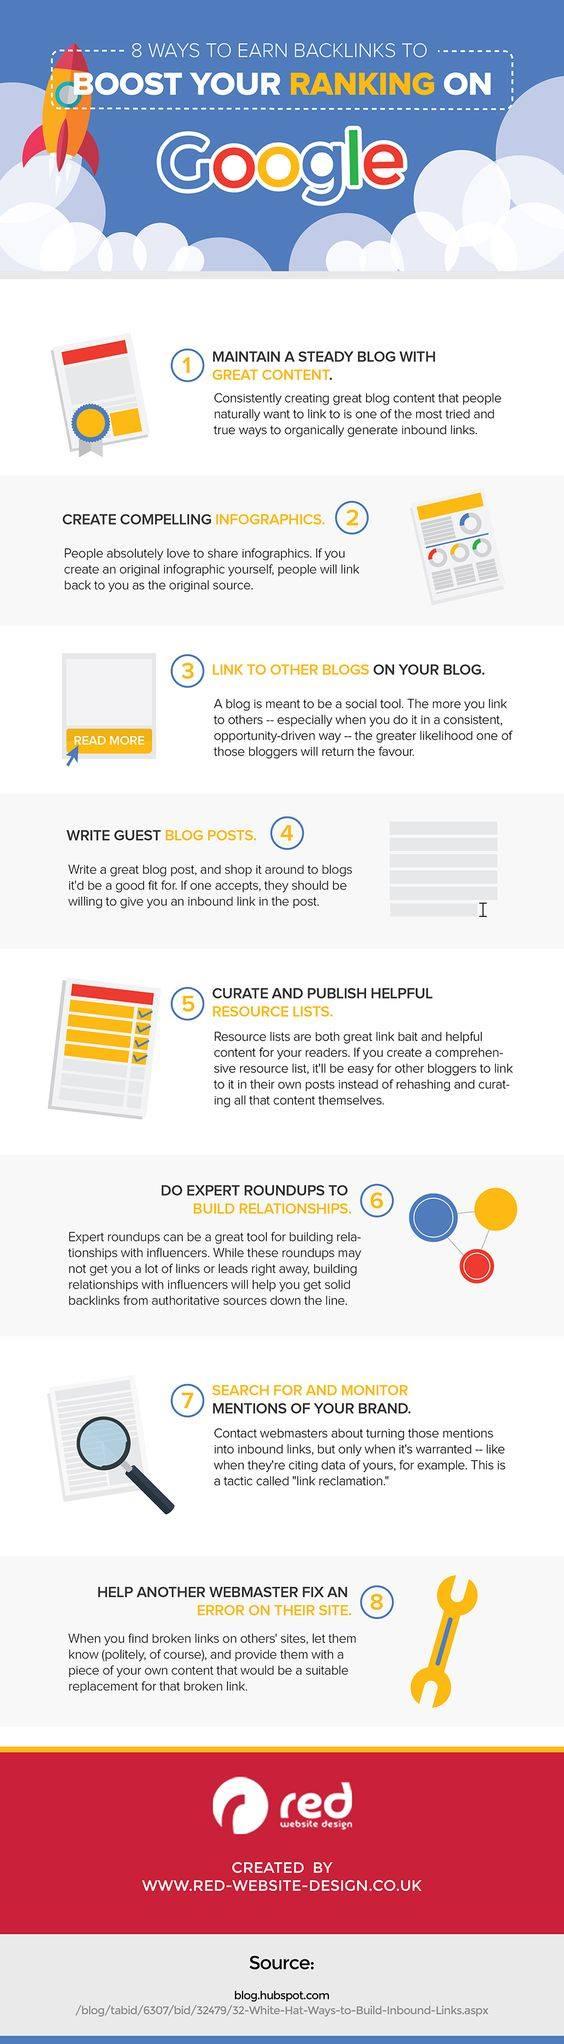 Google SEO Boost